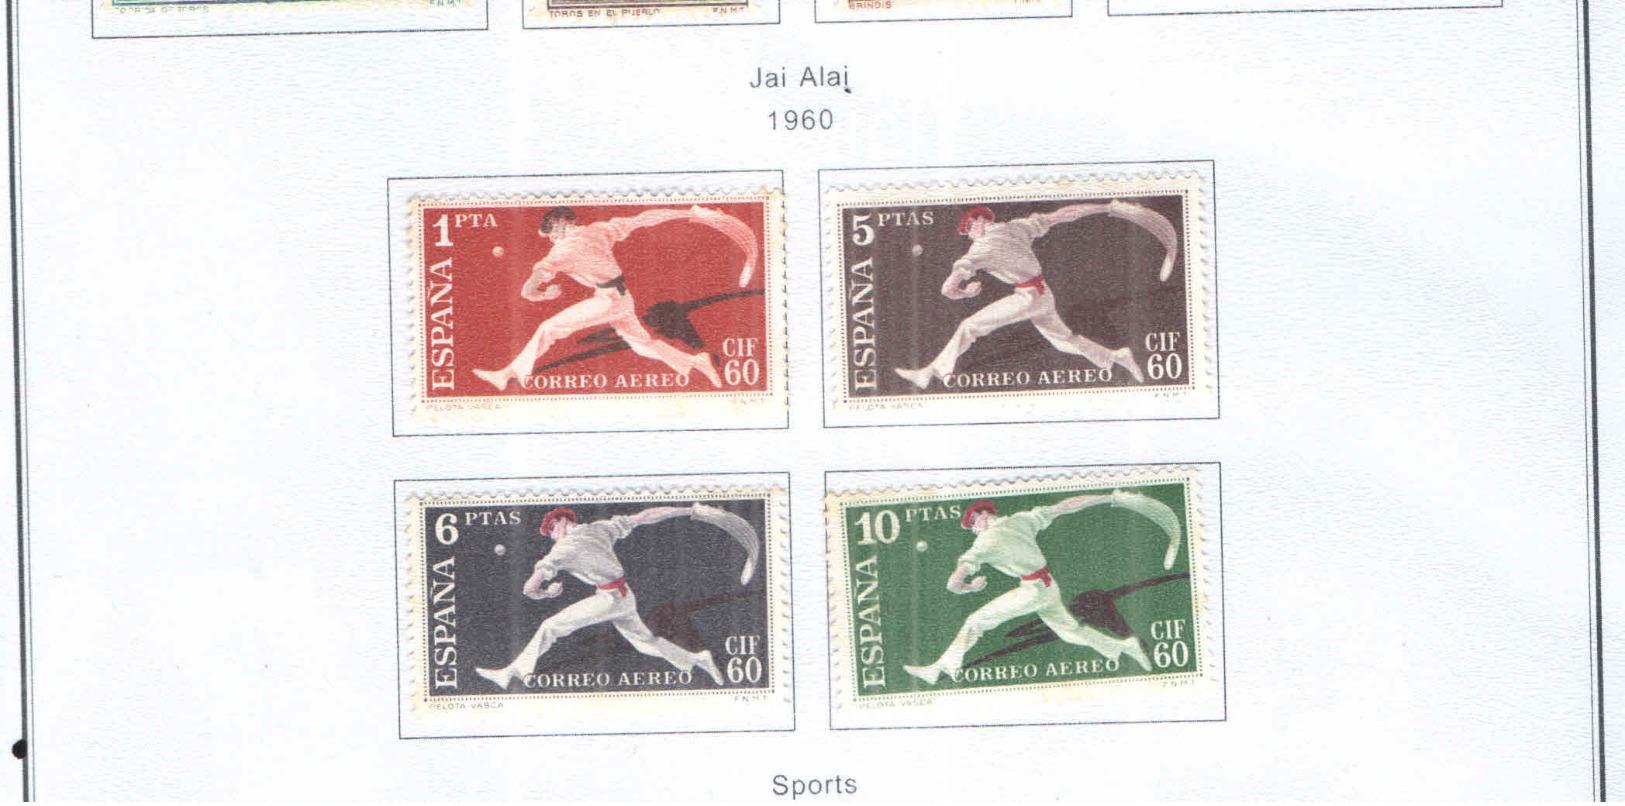 Spagna 1960 Jai Alai Arena Valori N.04 Scott.C163/166+ See Scans - Unused Stamps